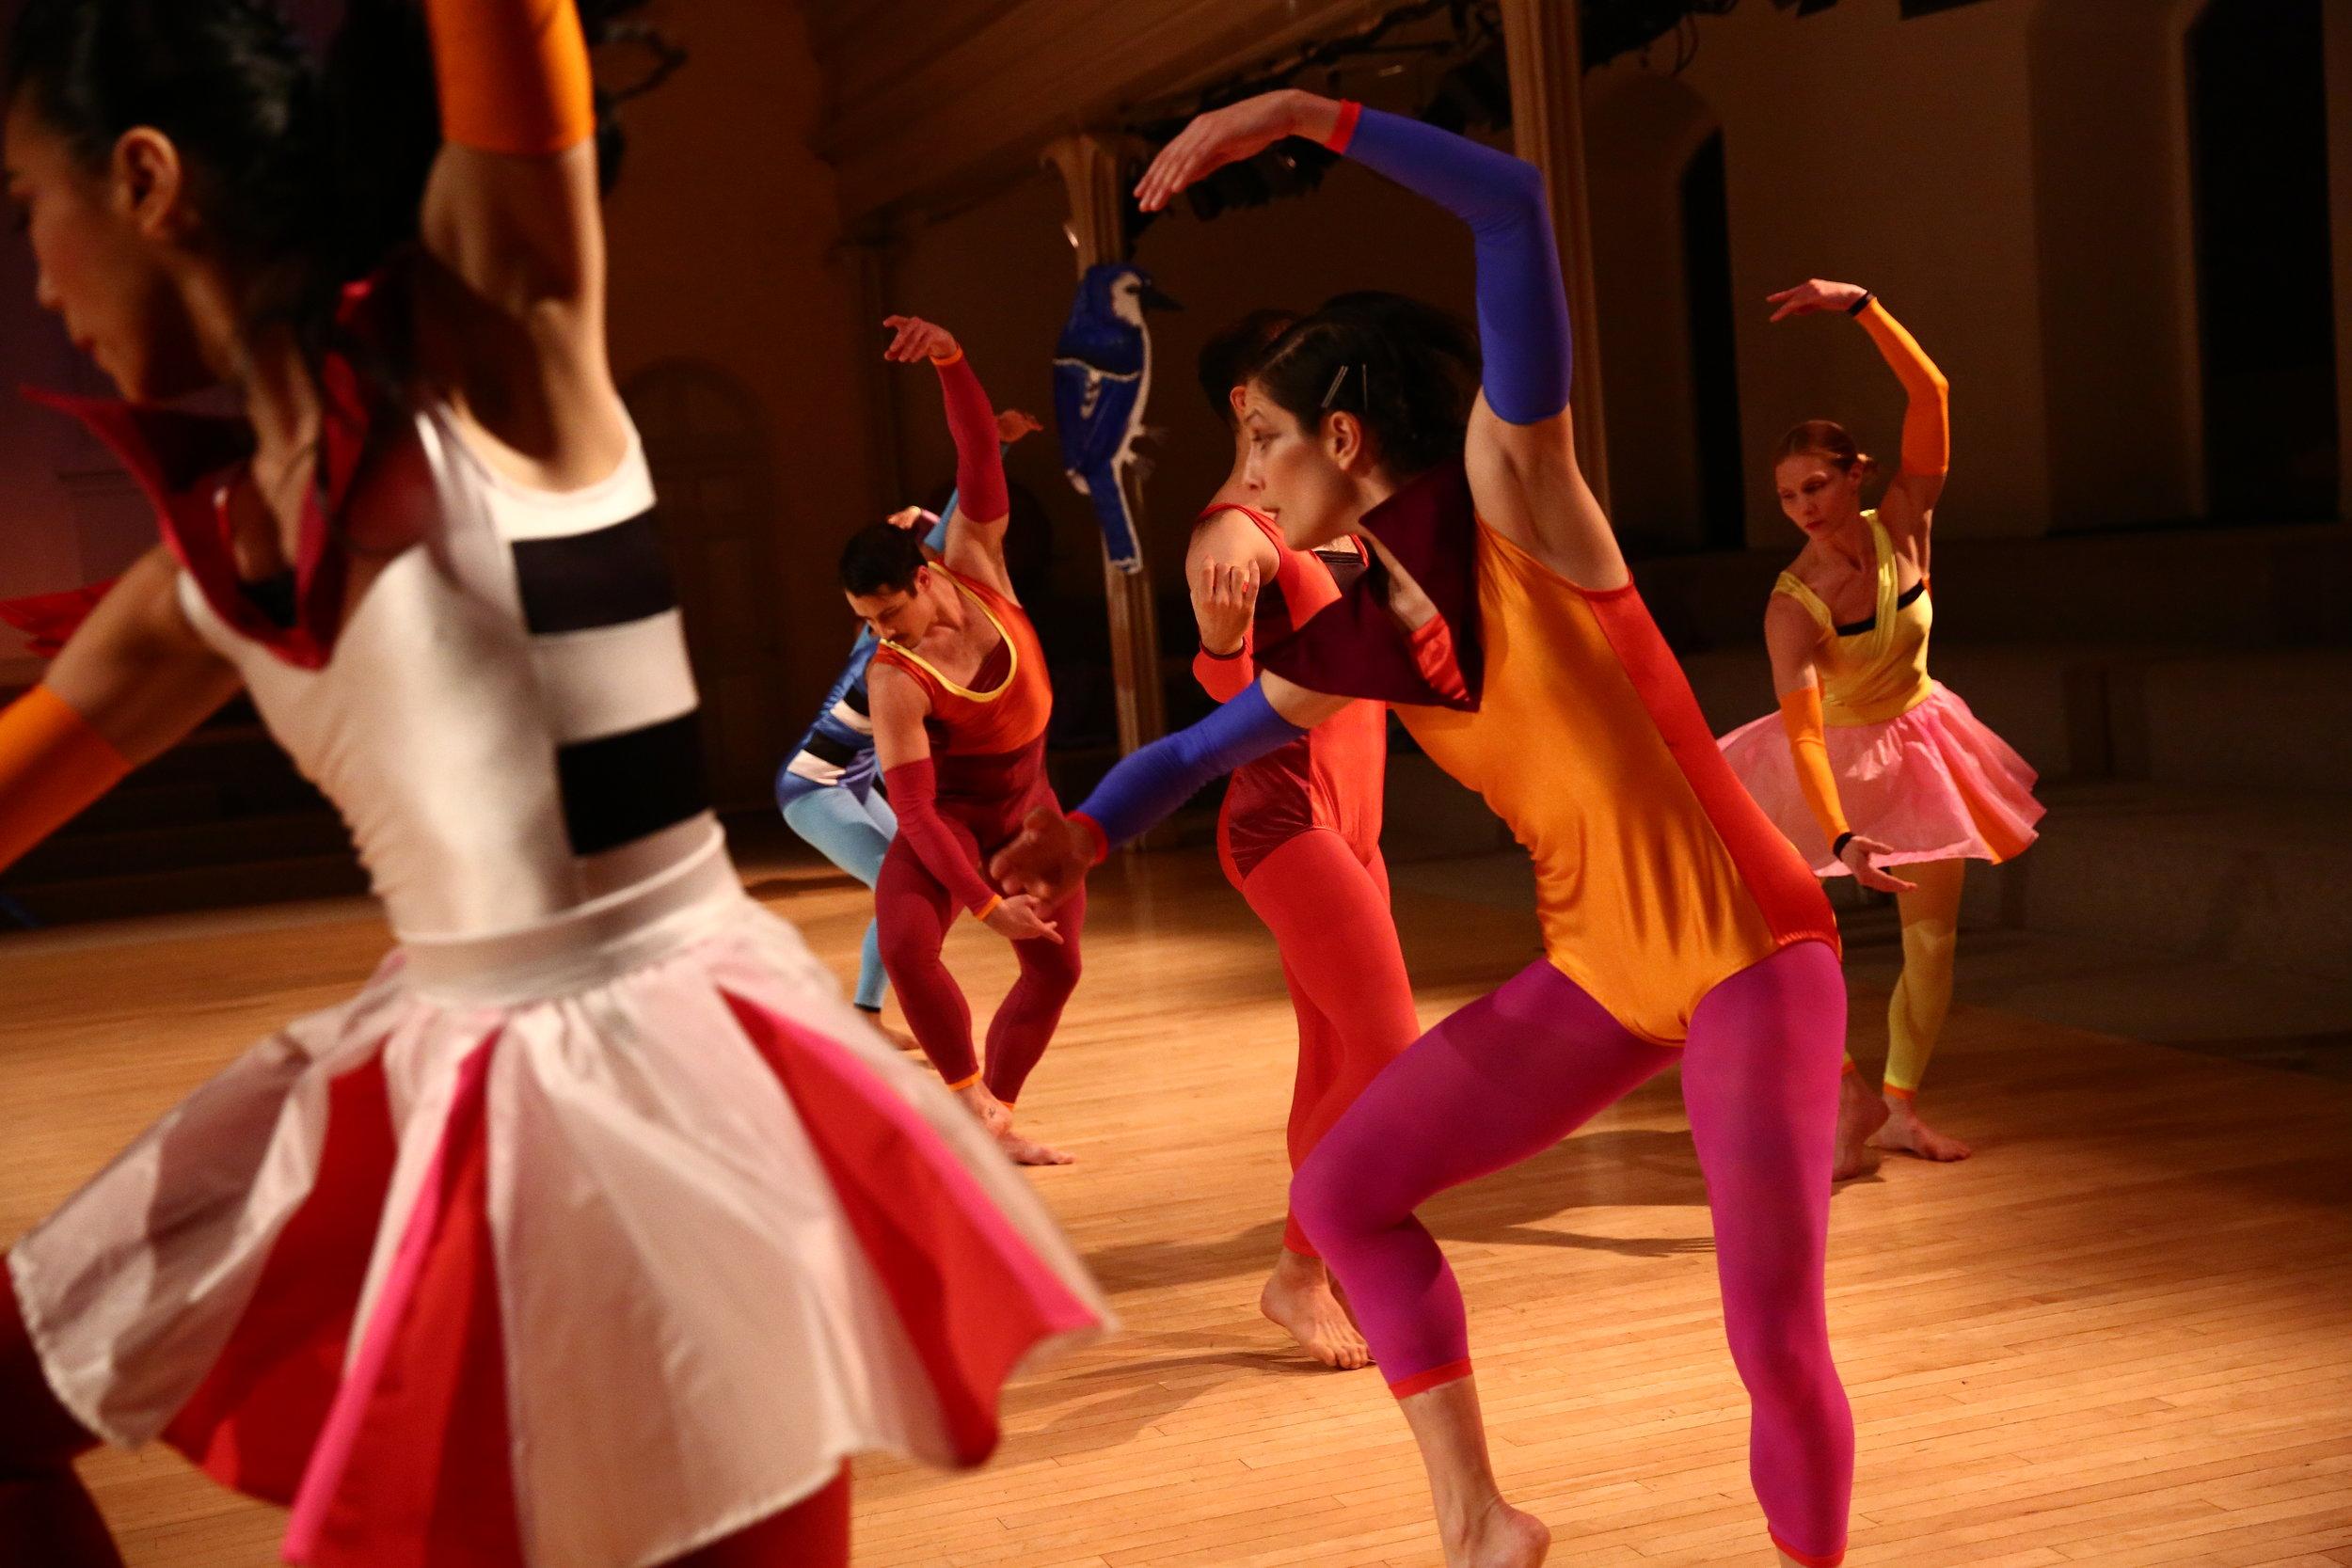 Dancers Left to Right: Jin Ju Song-Begin, Paul Singh, Jake Szczypek, Christopher Williams, Alexandra Berger, Emily Pope, Photo © Paula Court, 2017